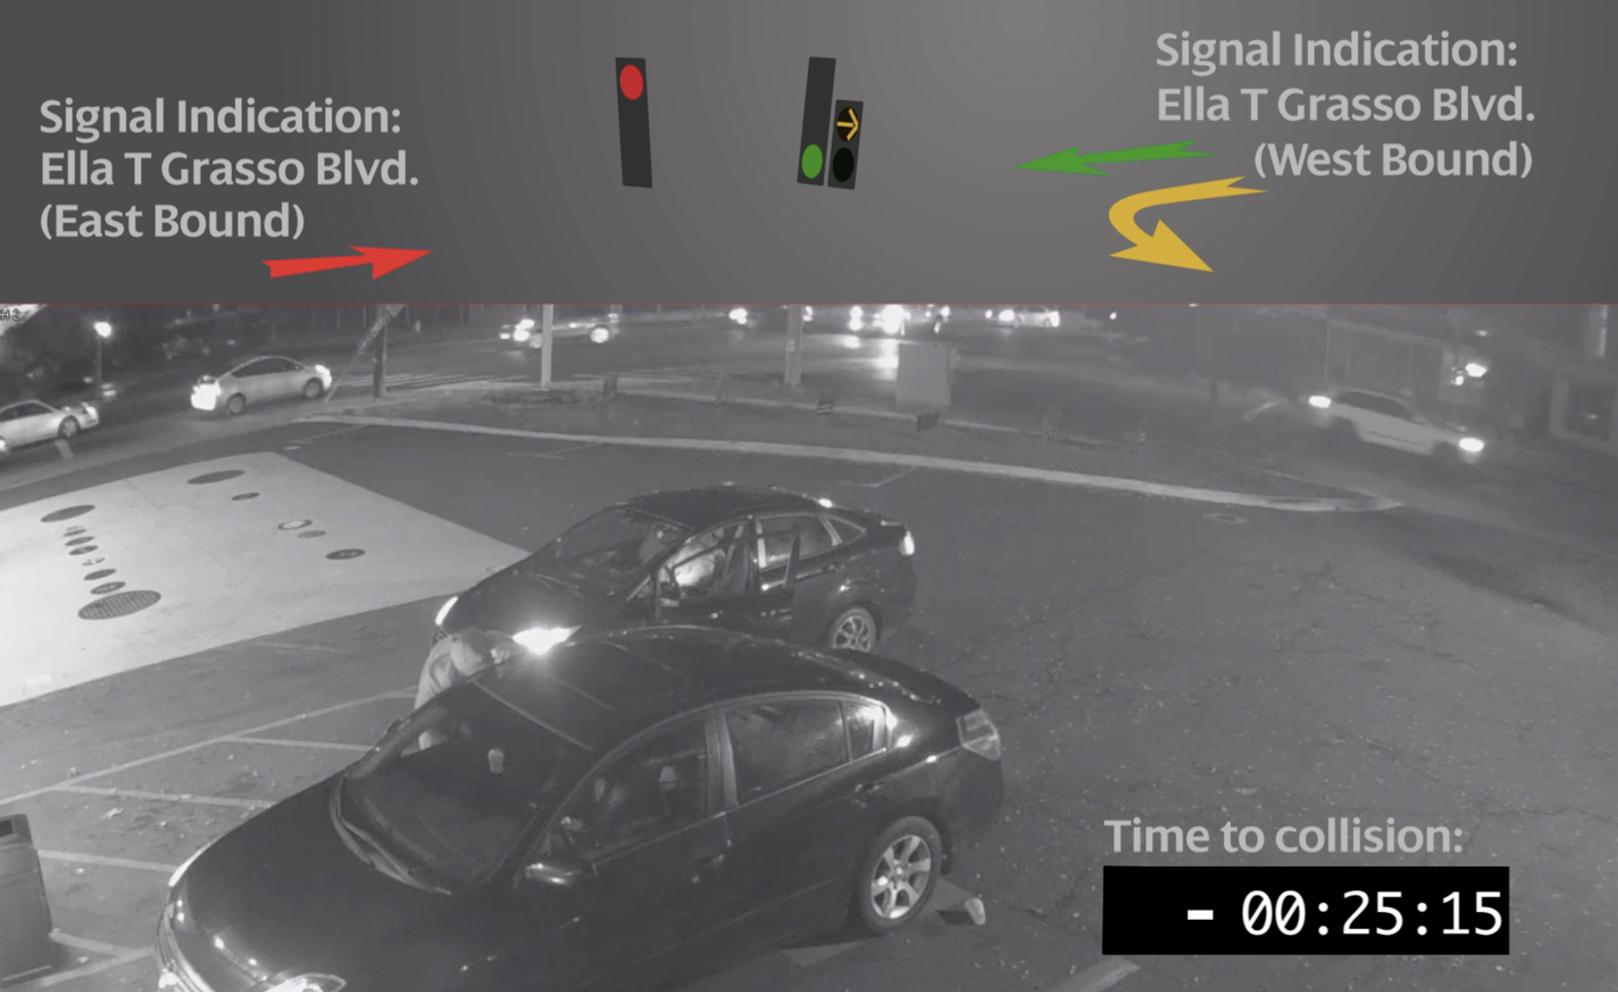 Traffic Lights Evidence Presentation